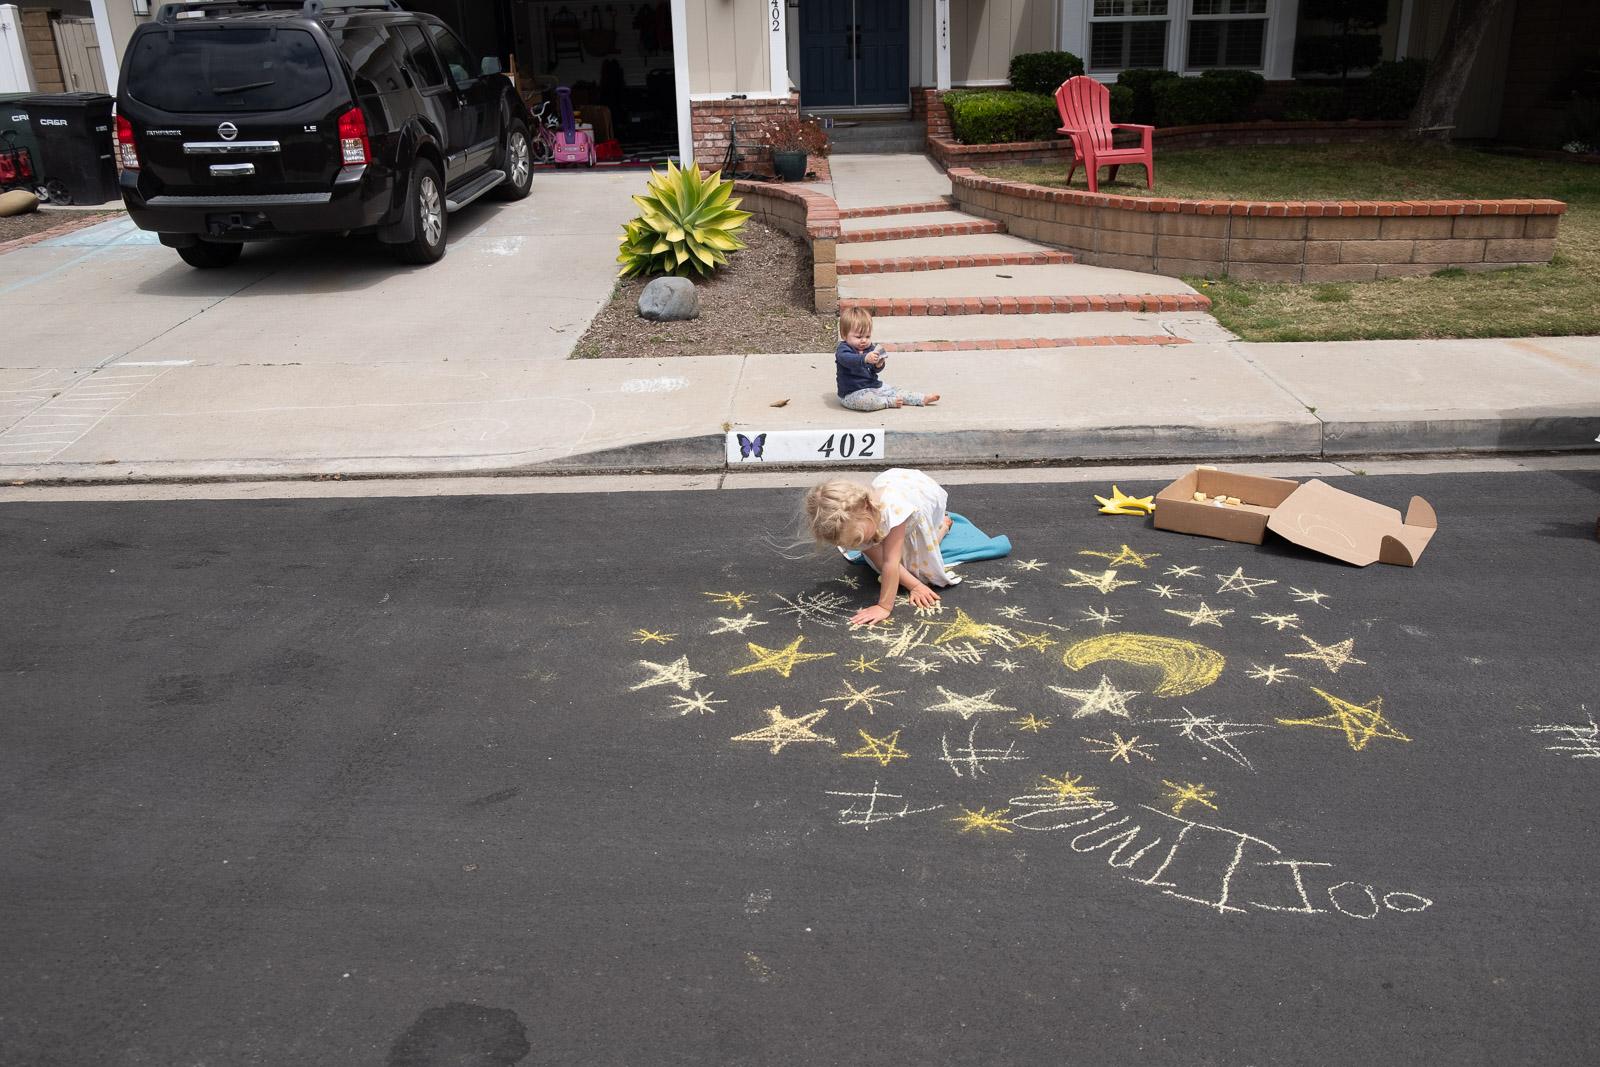 Unexpected Backdrop child drawing stars on asphalt karlee hooper